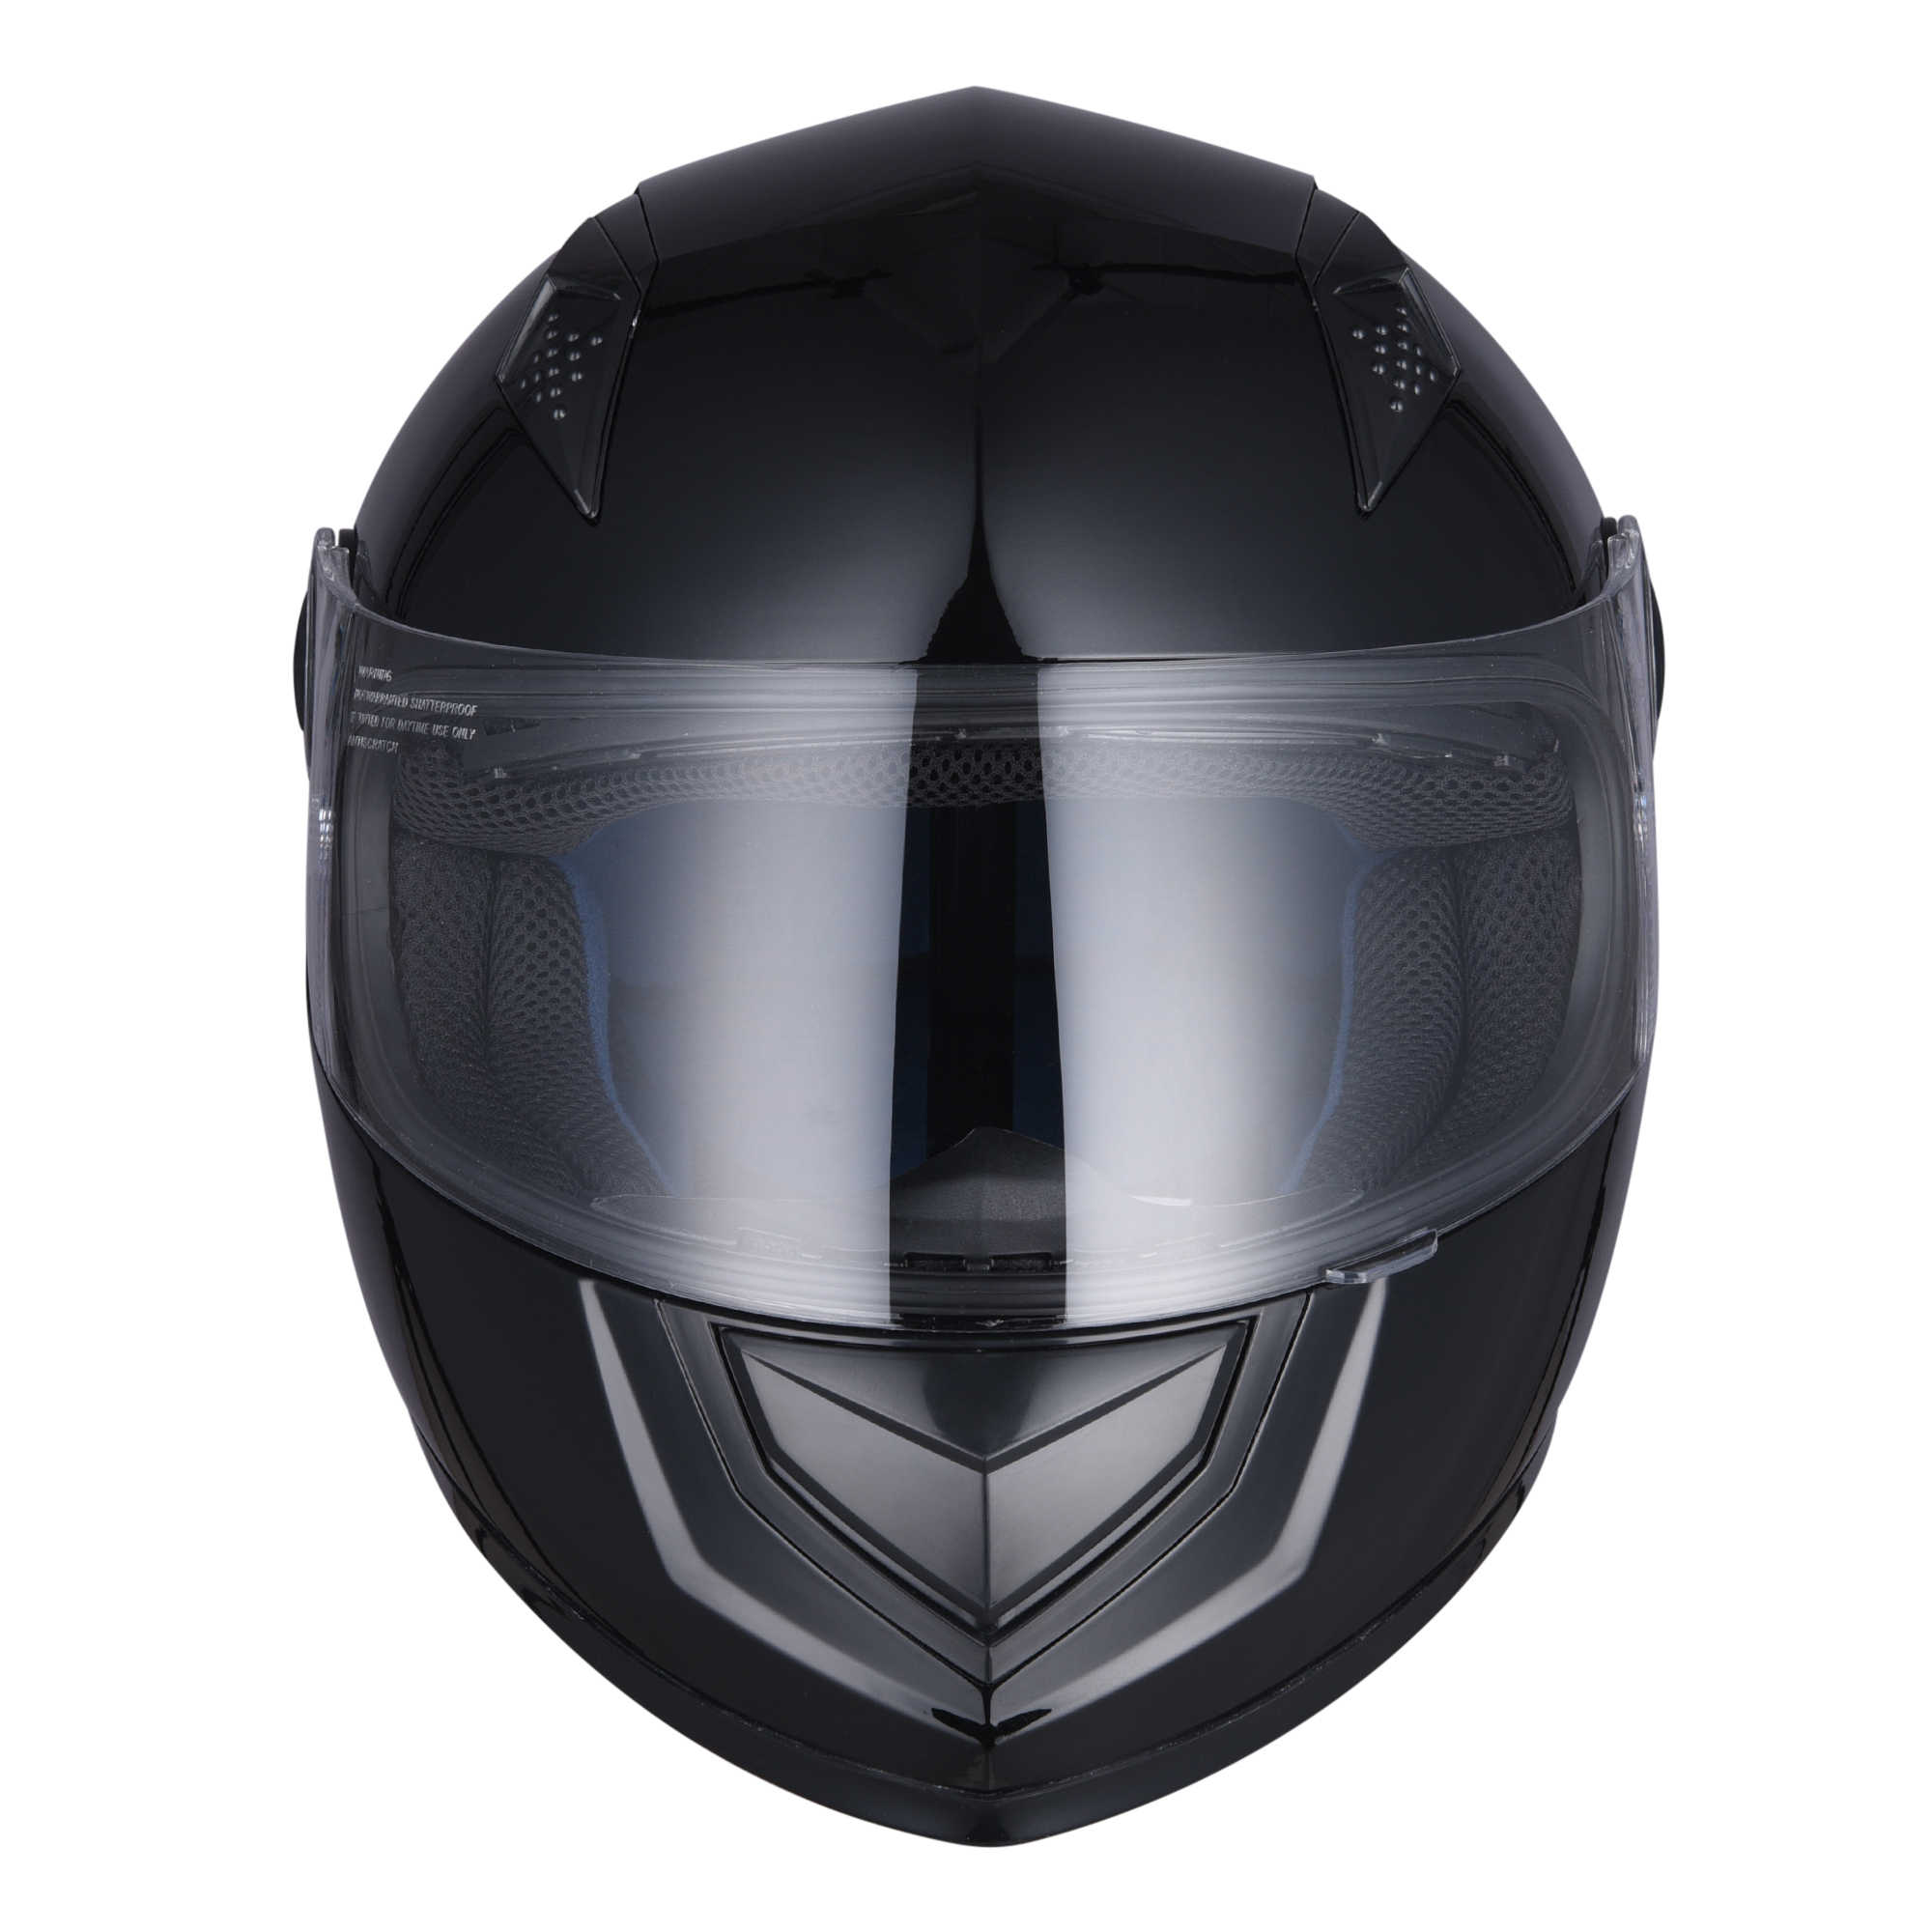 miniature 49 - AHR K12 Full Face Motorcycle Helmet DOT Air Vents Clear Visor Racing S M L XL